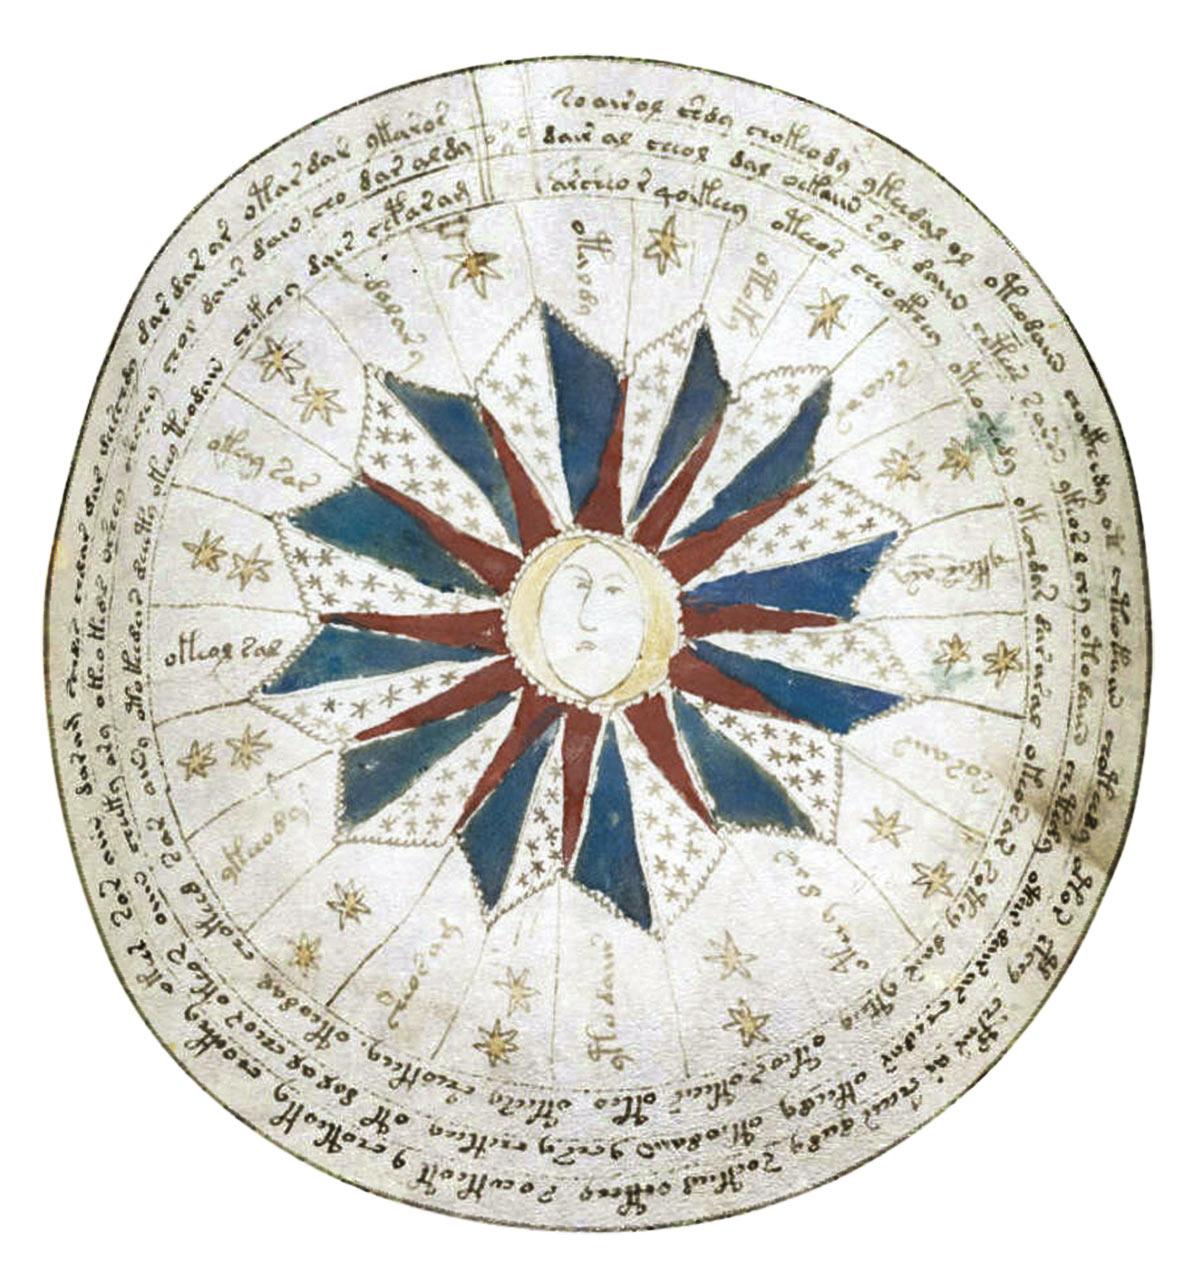 codice-voynich-astronomico. Detalle de un dibujo